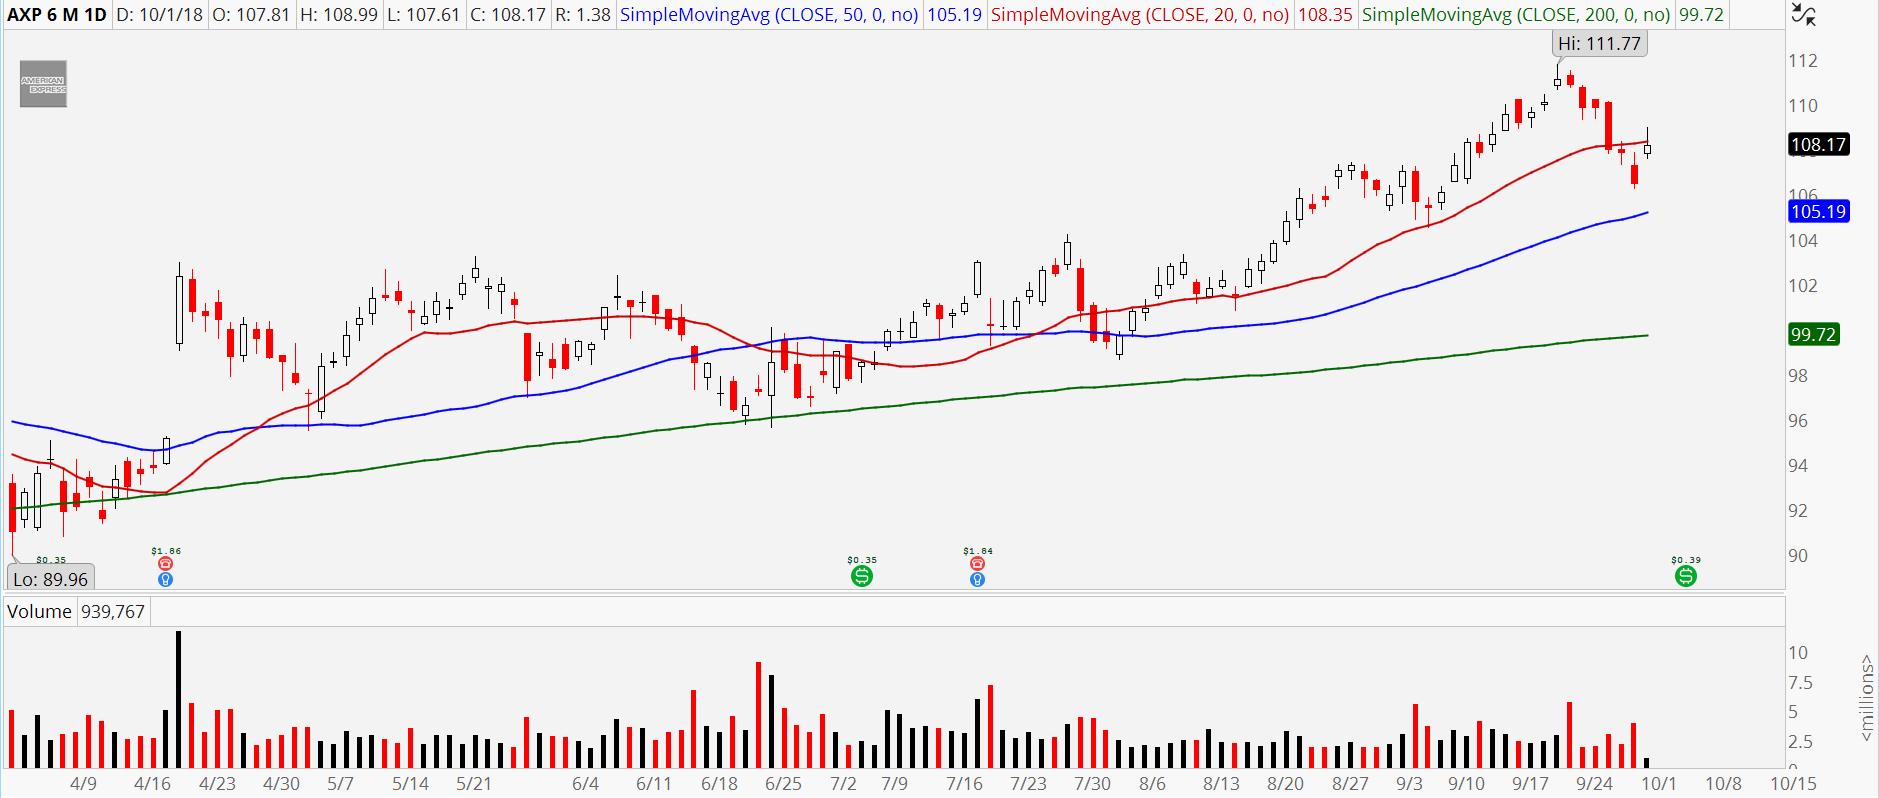 3 Dow Jones Stocks to Buy Today | InvestorPlace